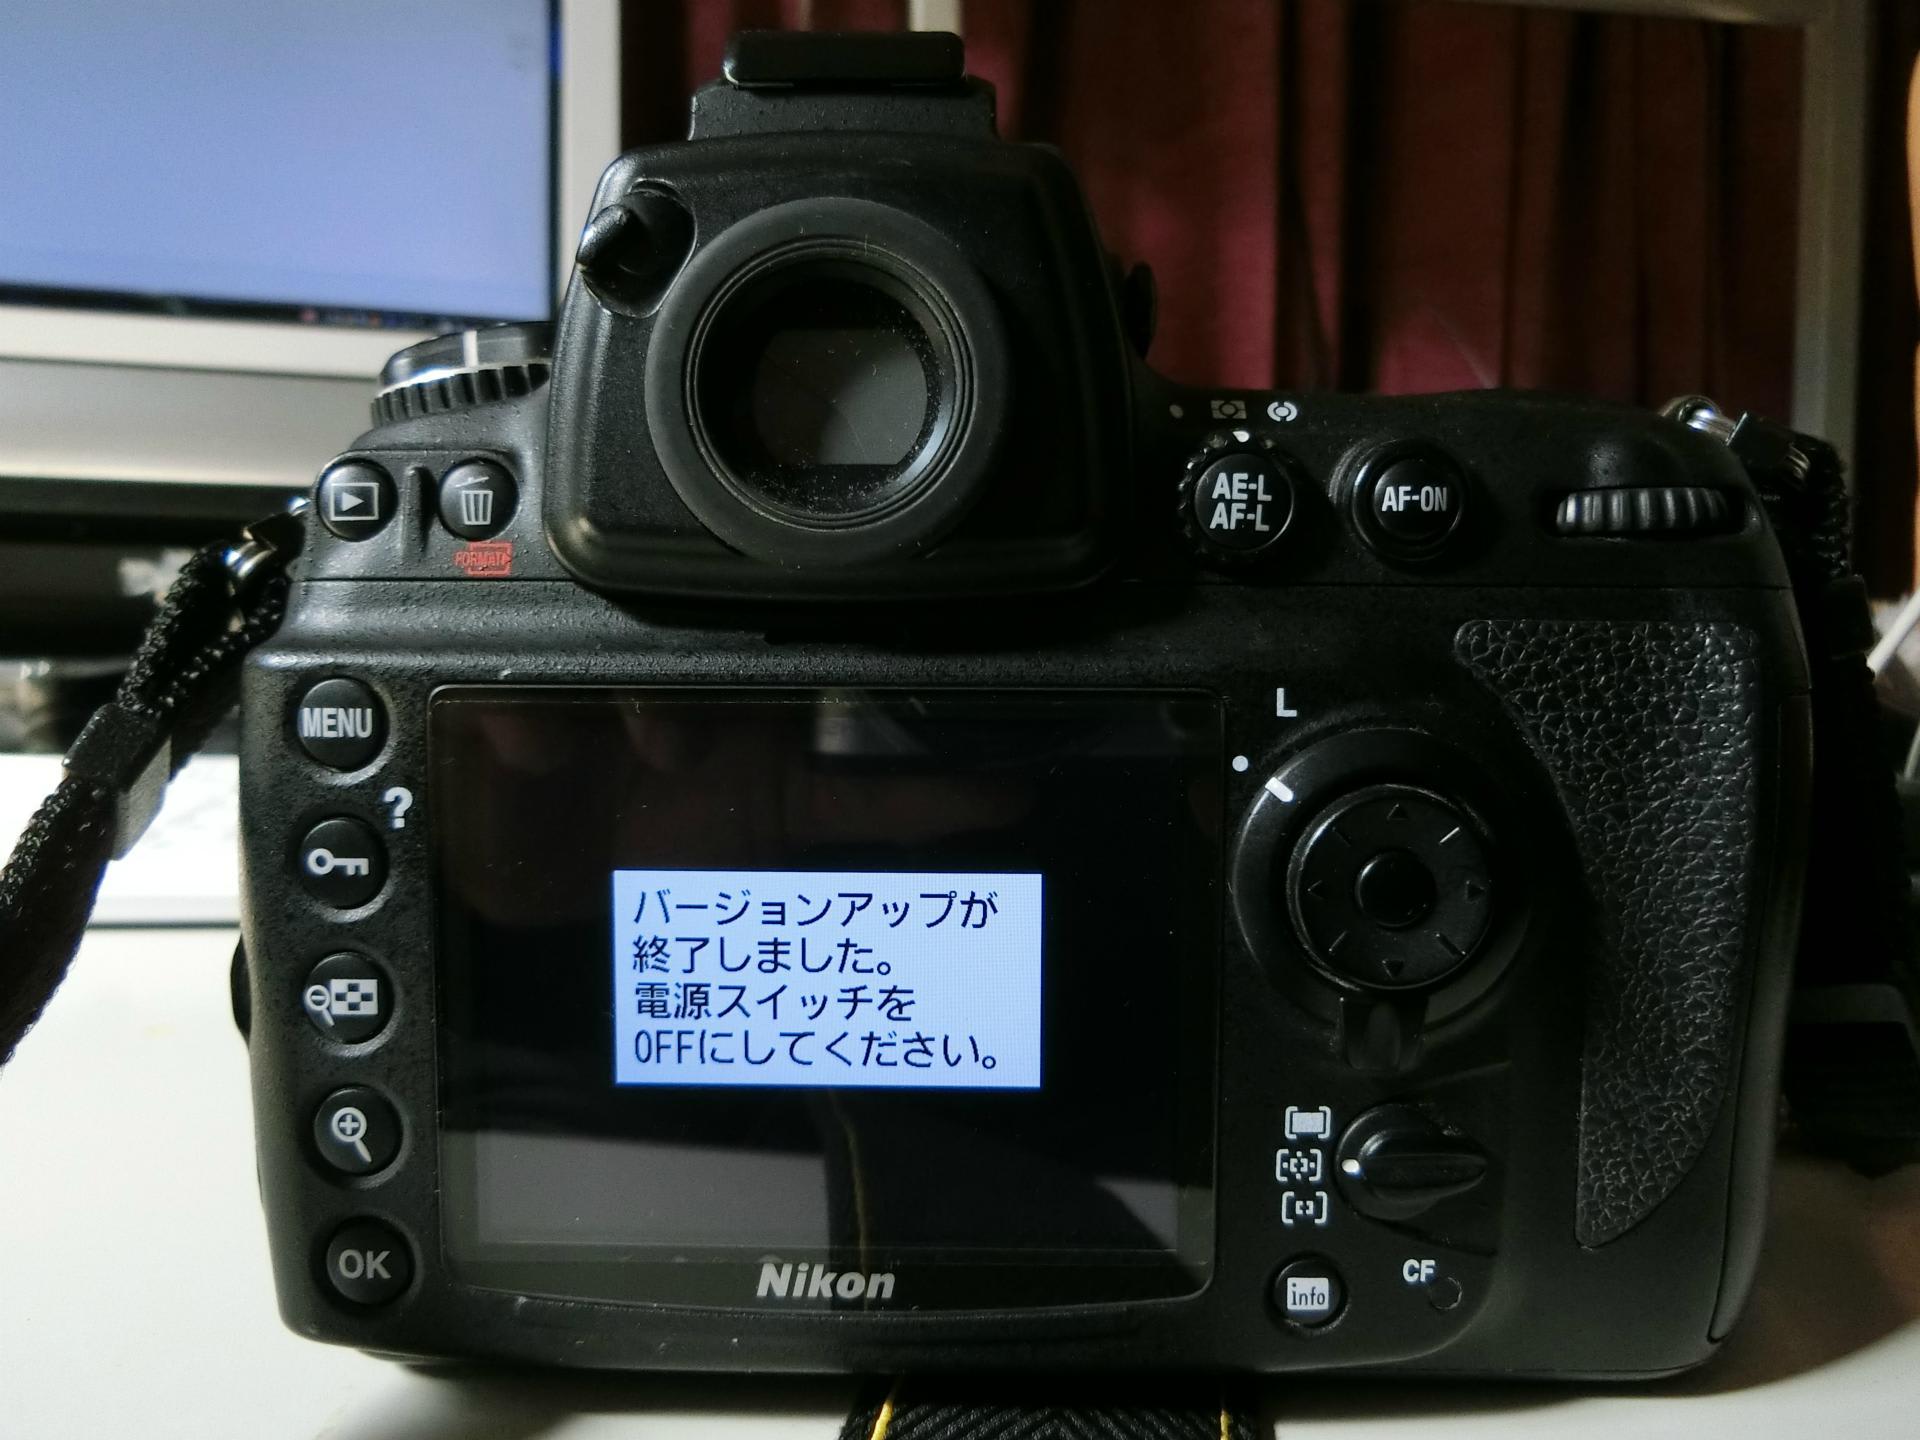 nikon d700 ファームウェア 最新バージョン